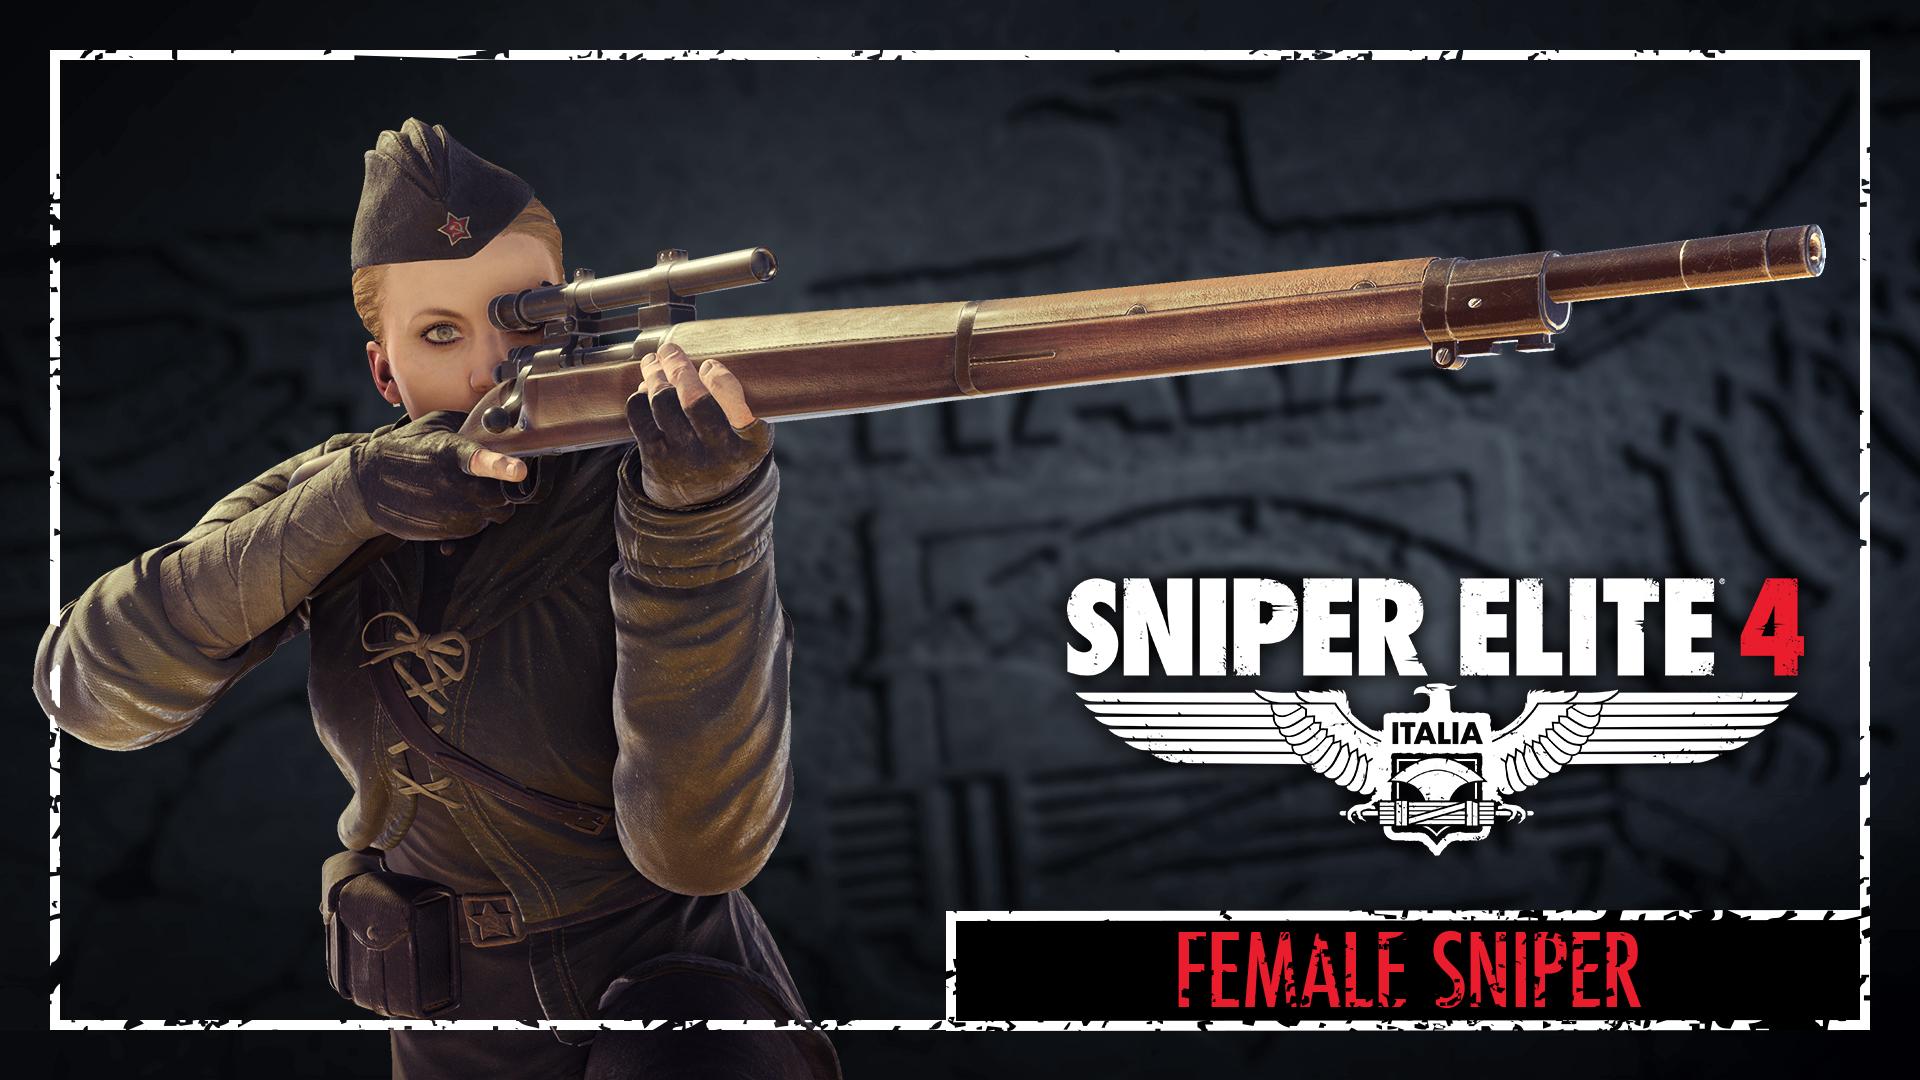 Sniper Elite 4 - Covert Heroes Character Pack screenshot